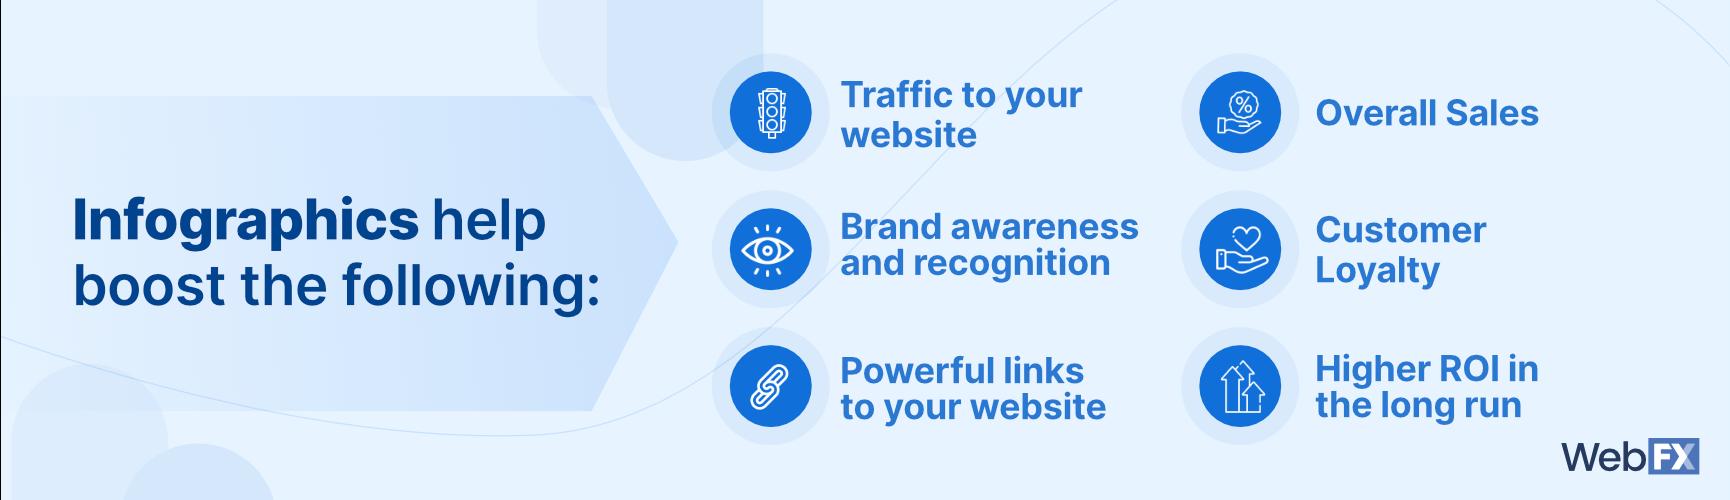 infographics help boost traffic